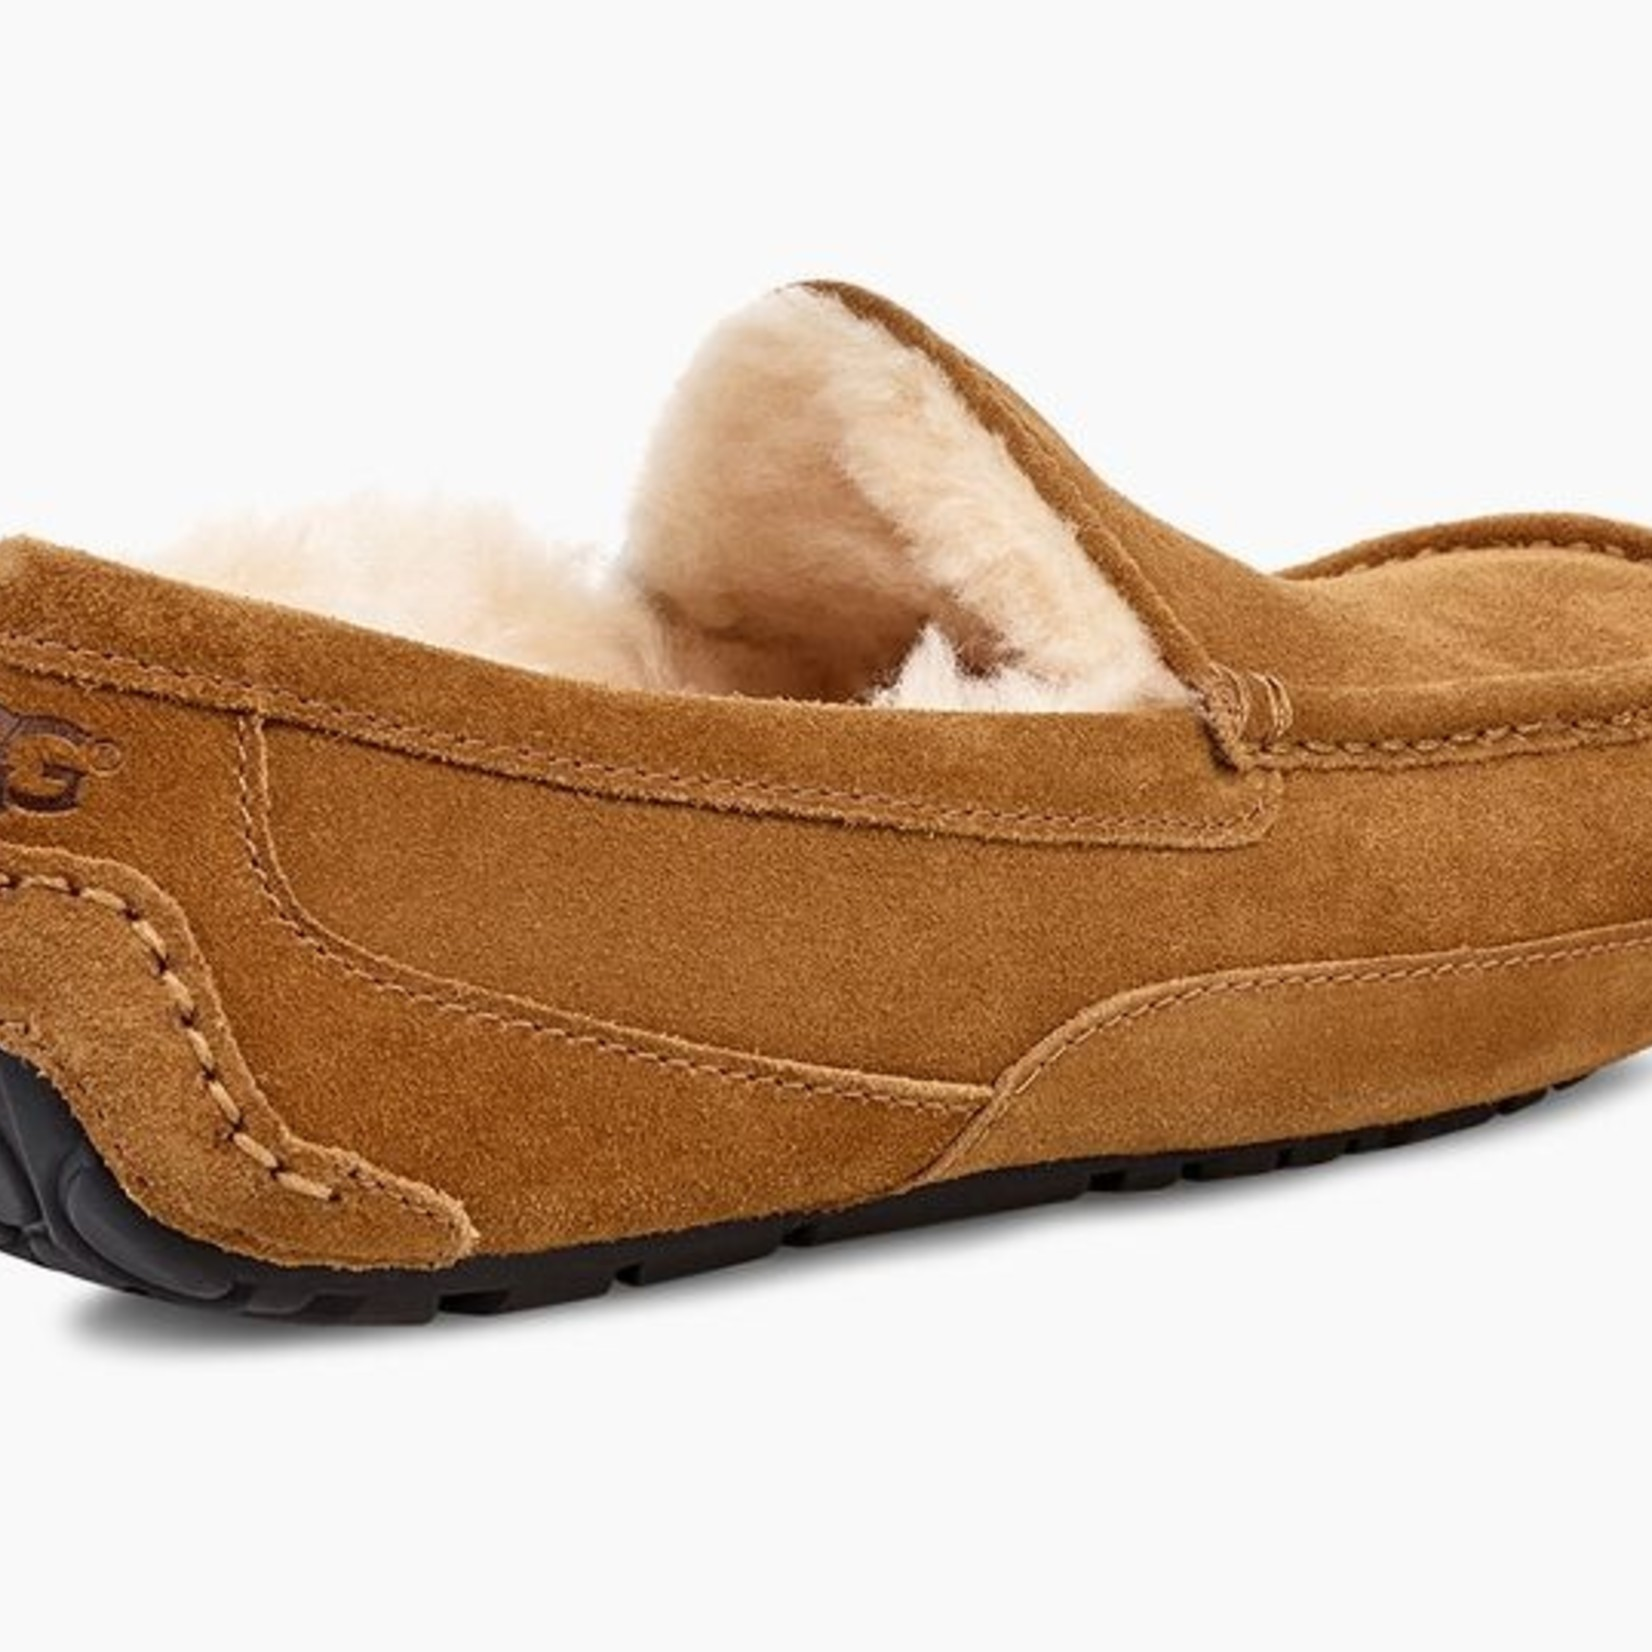 Ugg Ugg Mens Ascot Slip Ons